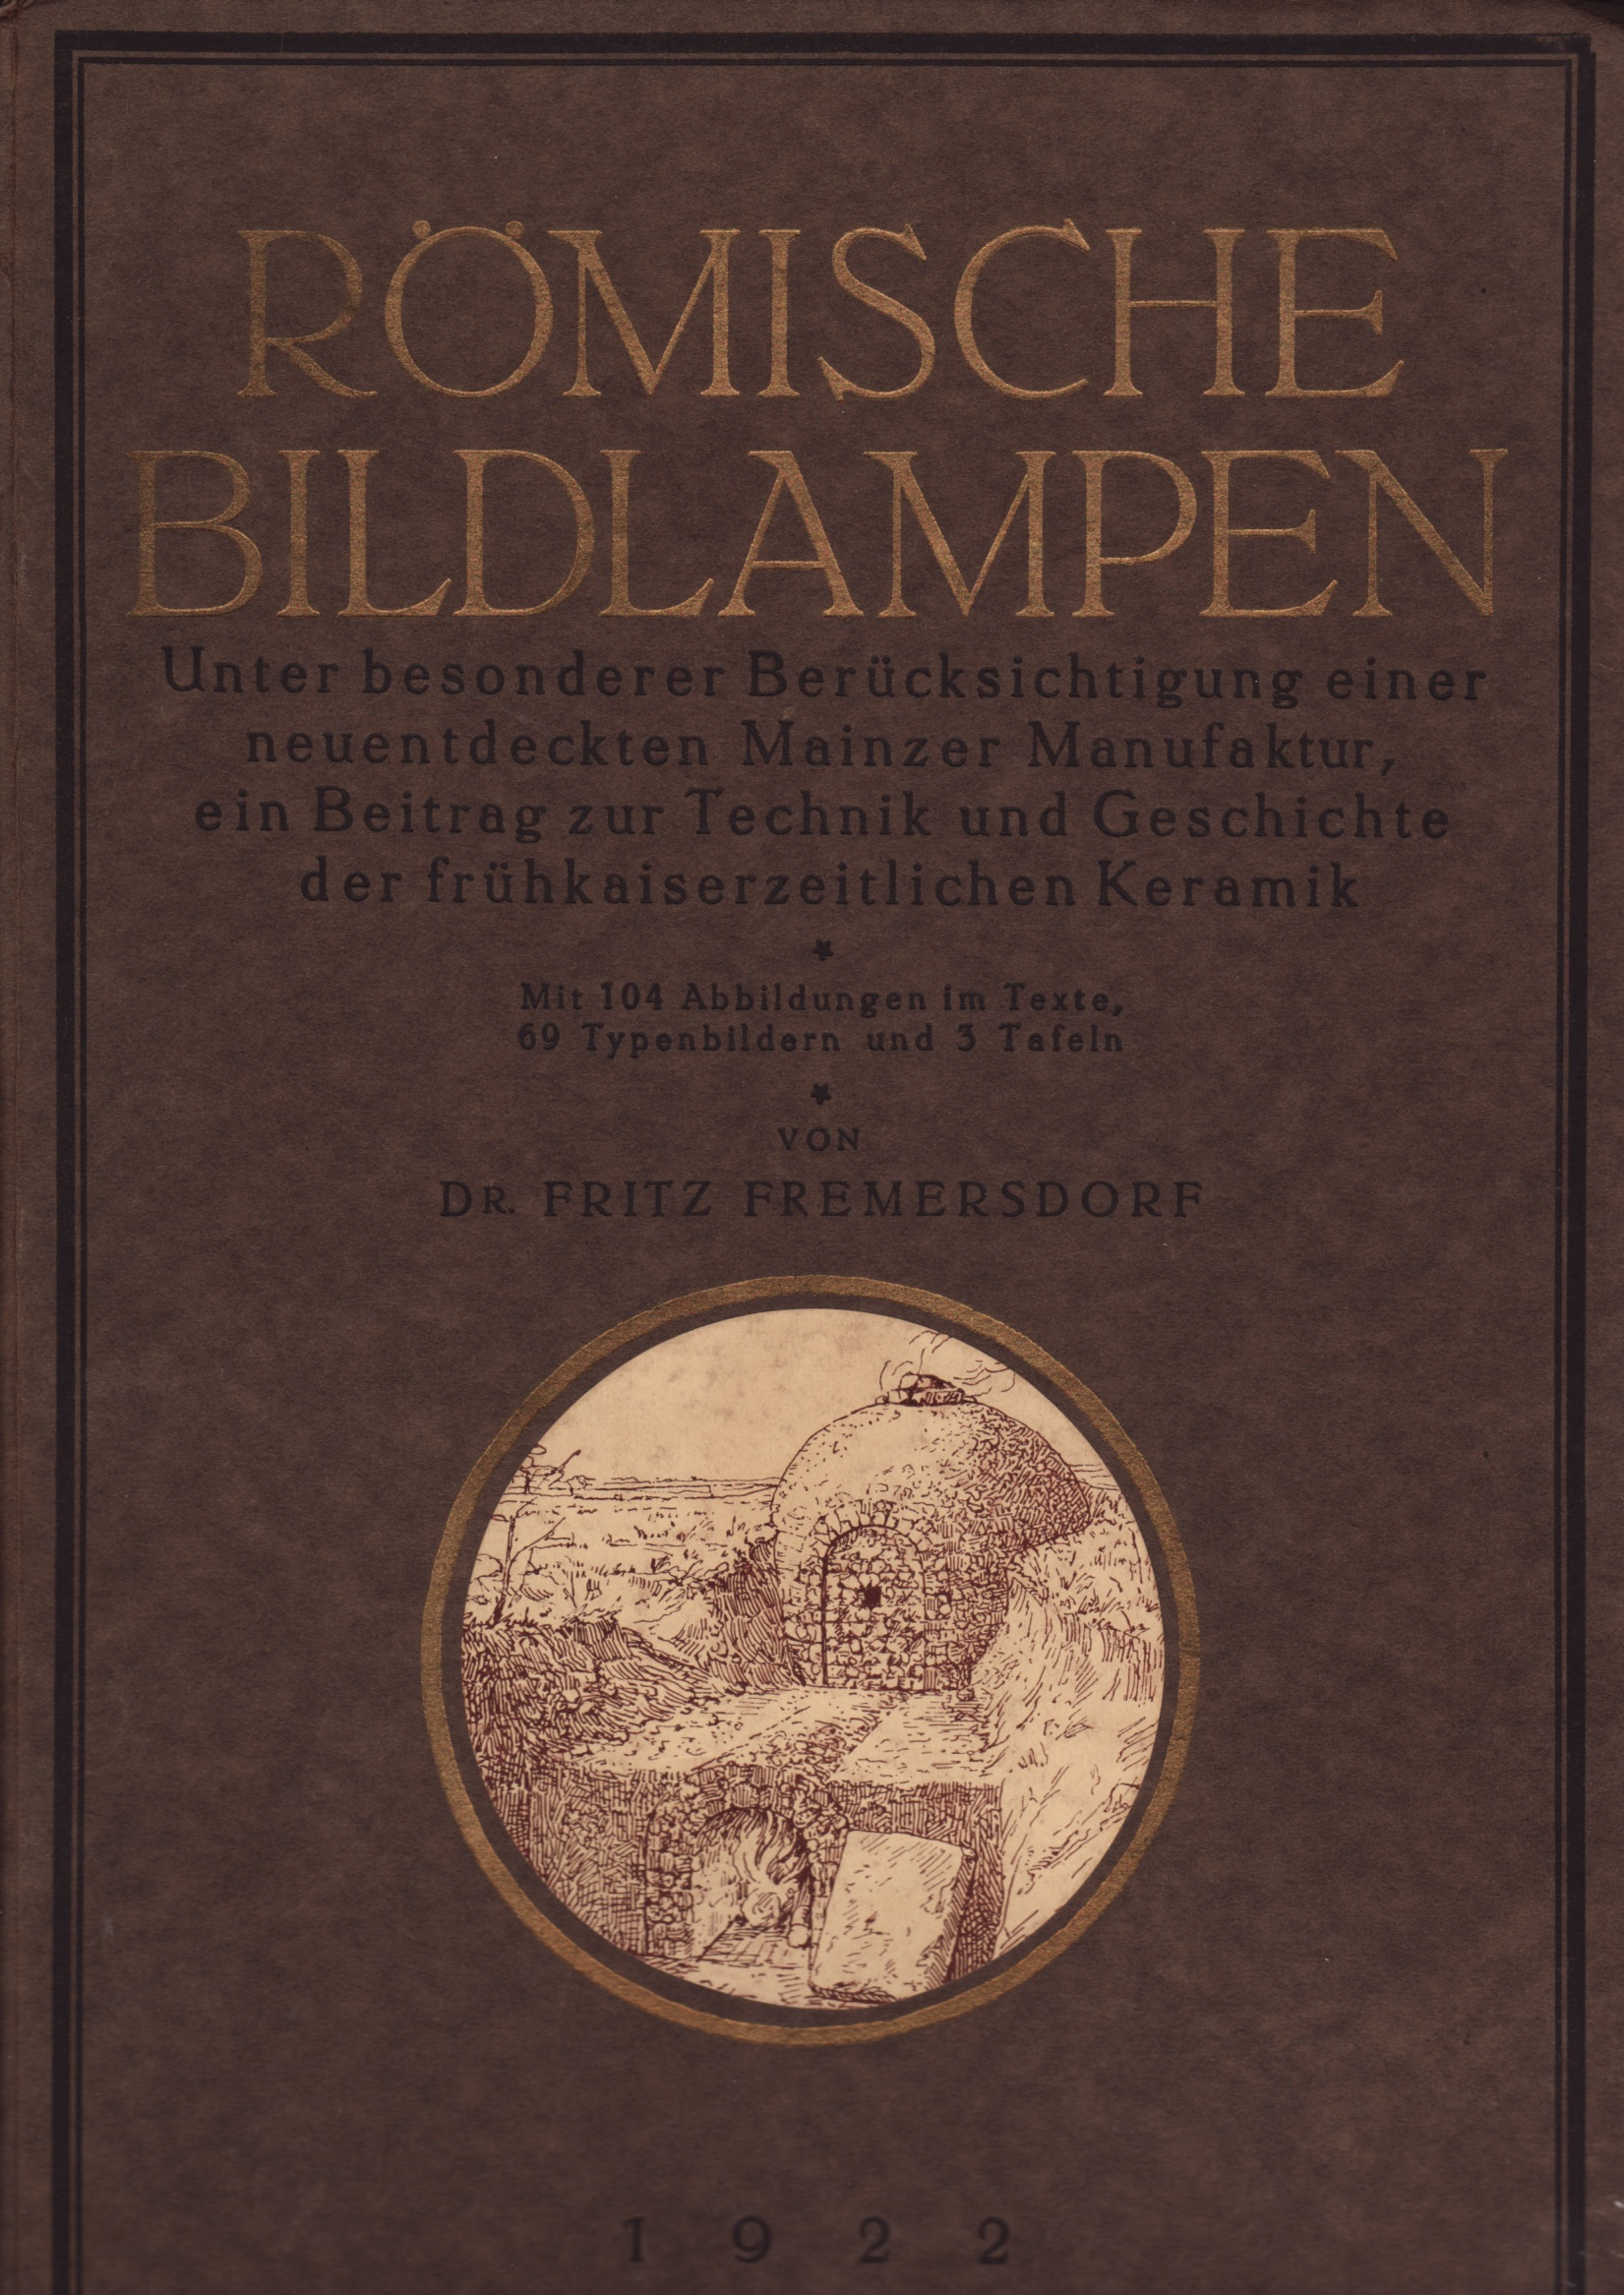 fremersdorf 1922